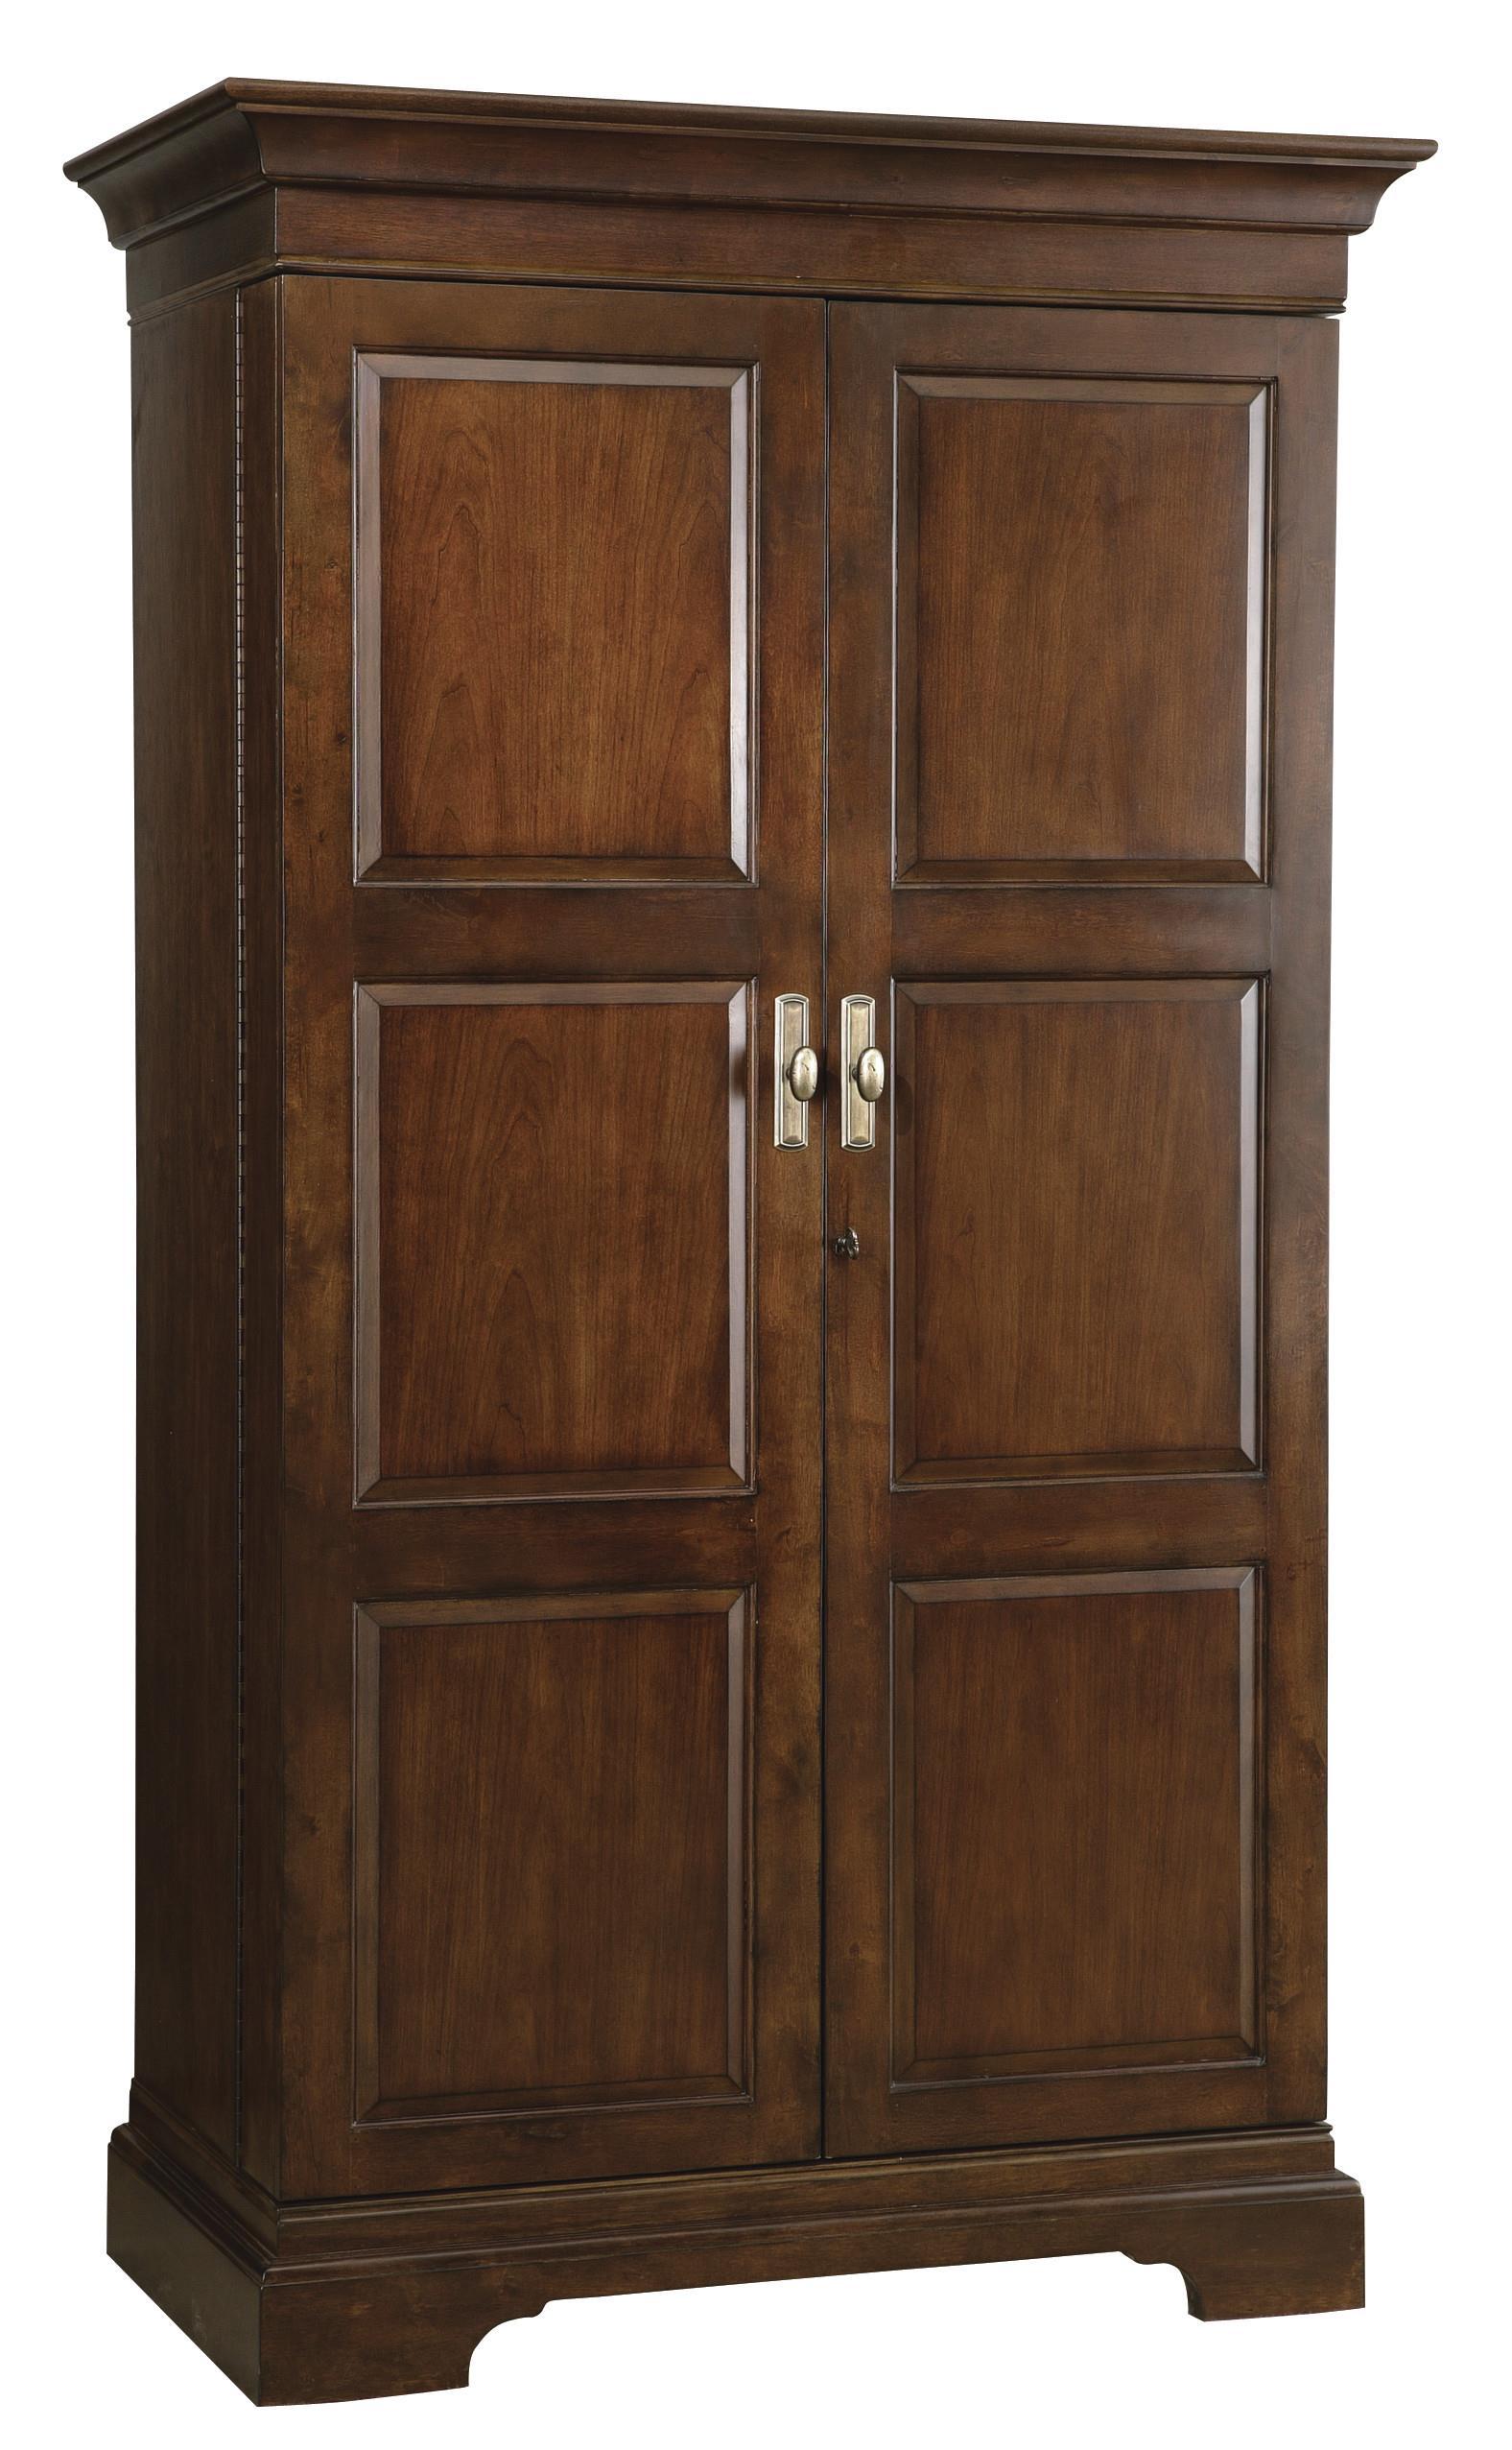 Howard Miller Wine & Bar Furnishings Sonoma Cabinet - Item Number: 695-064